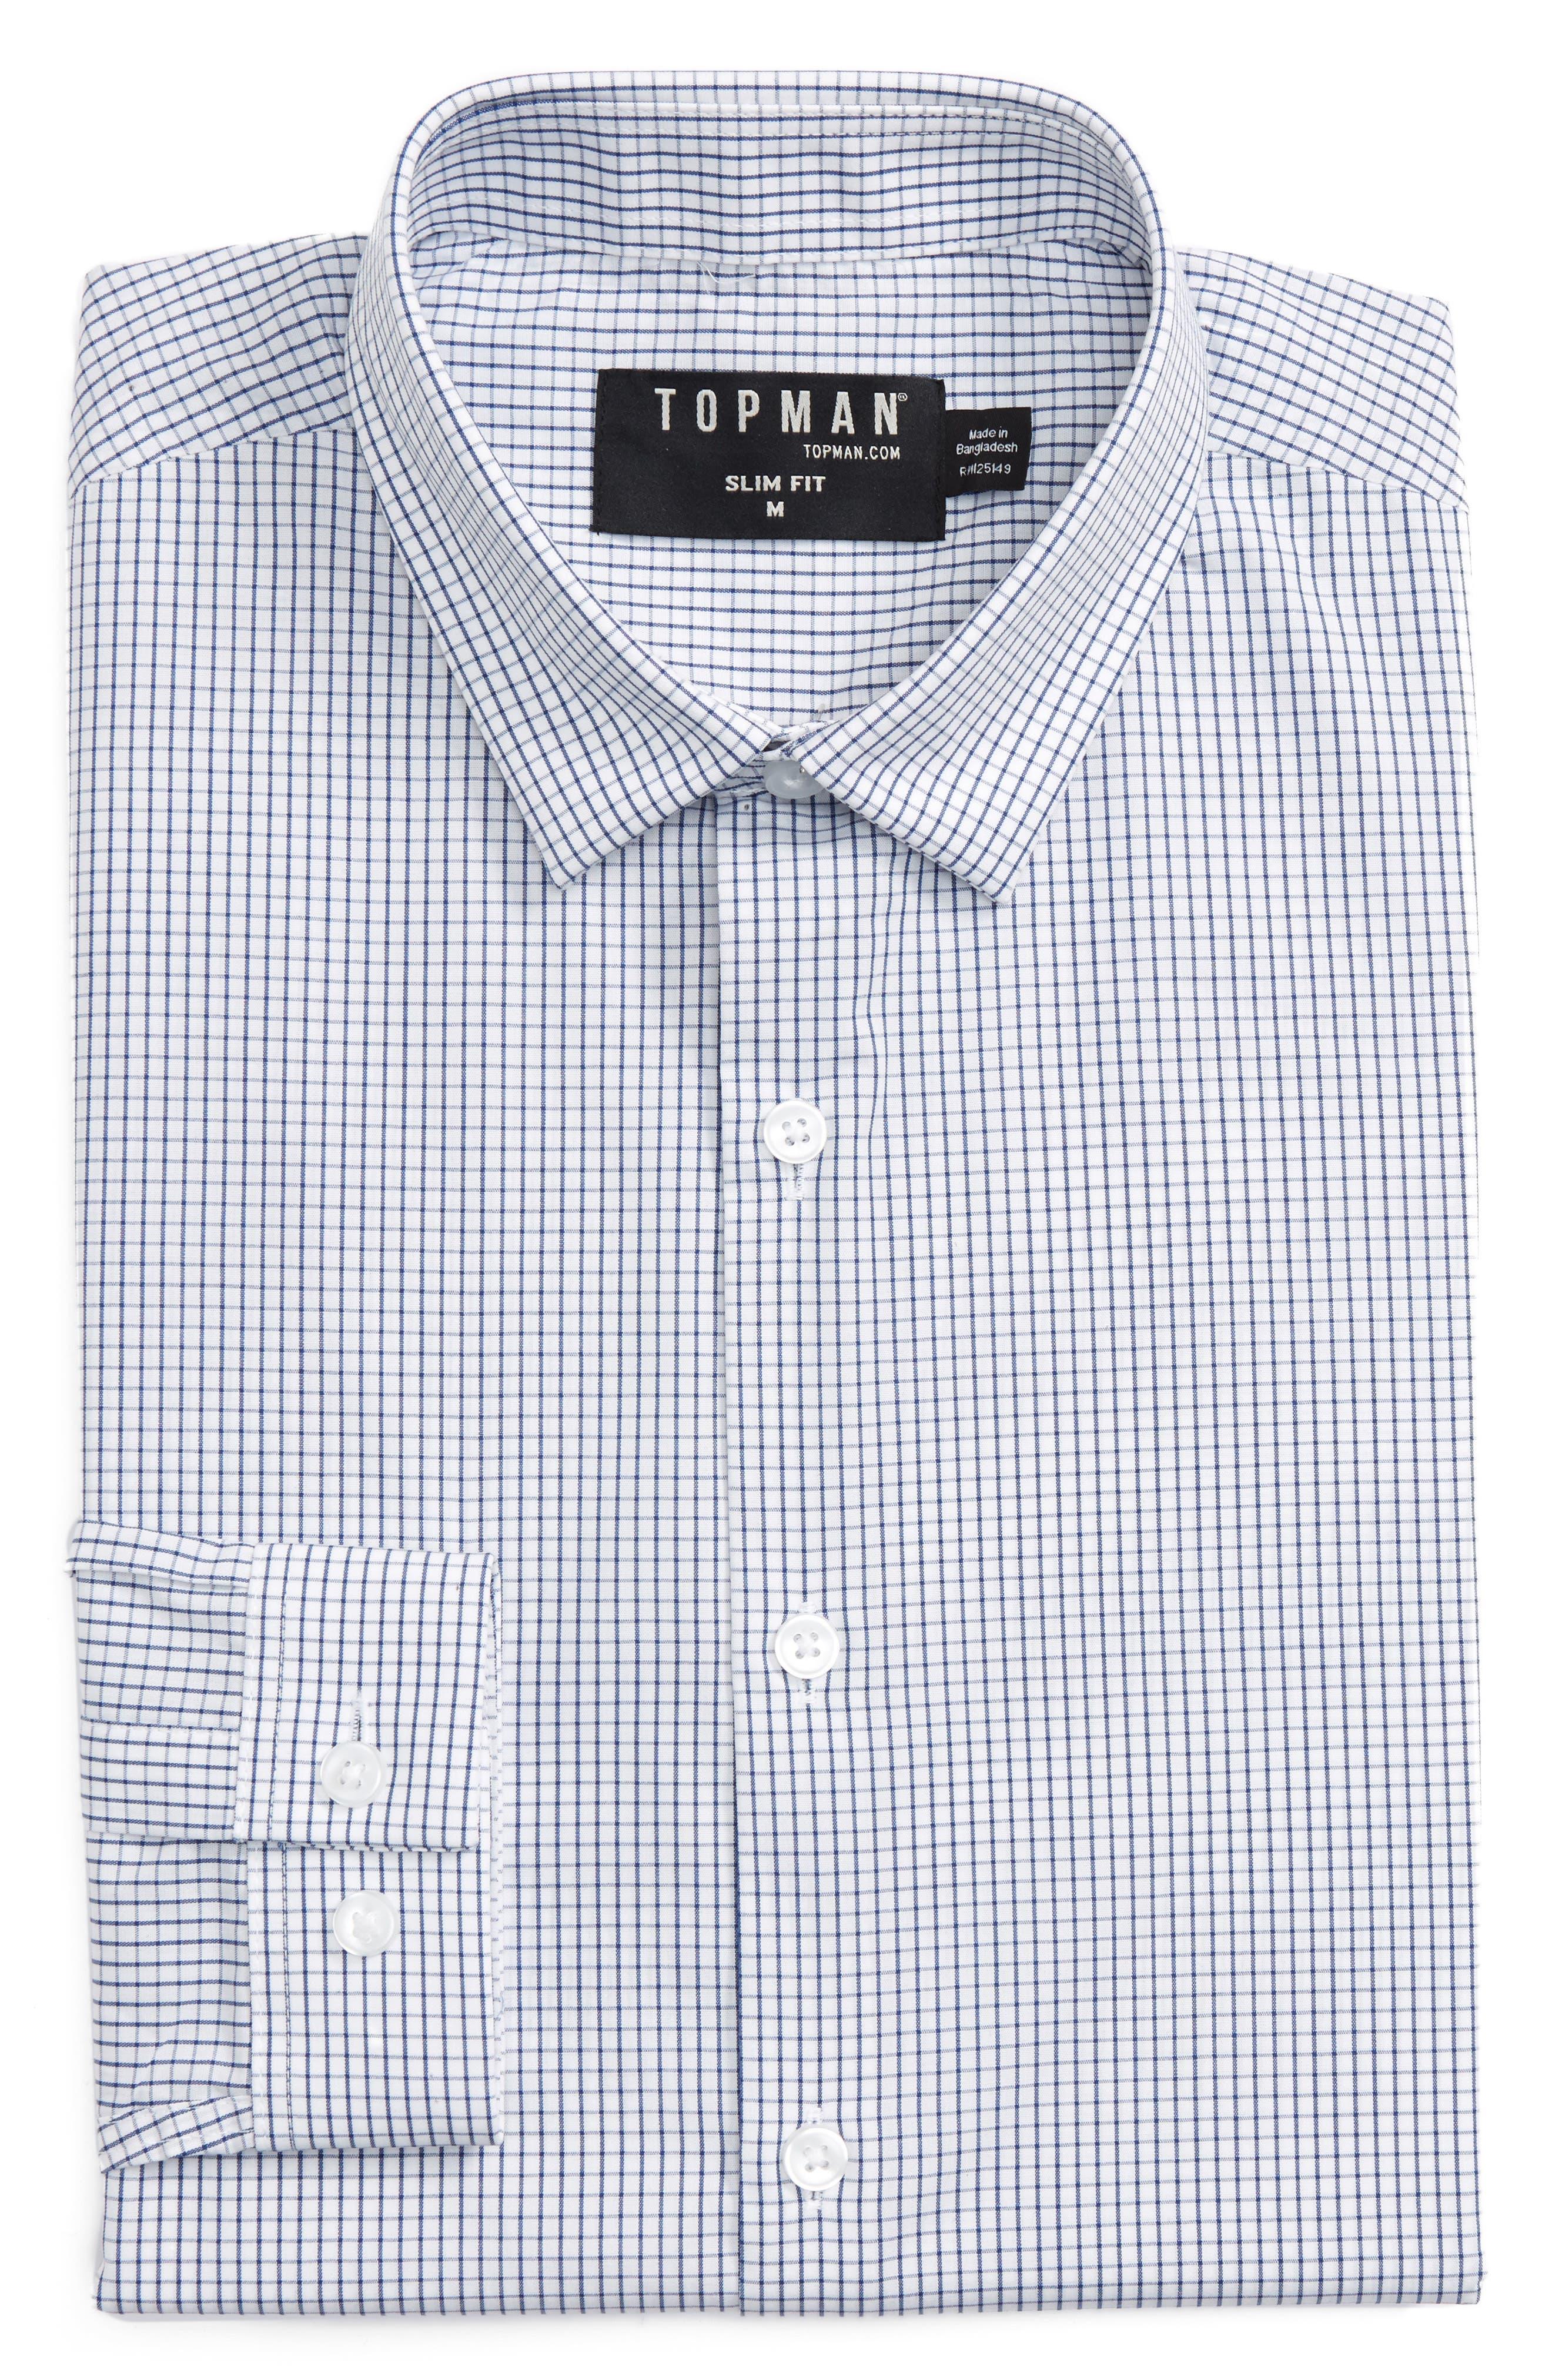 Topman Slim Fit Grid Check Dress Shirt